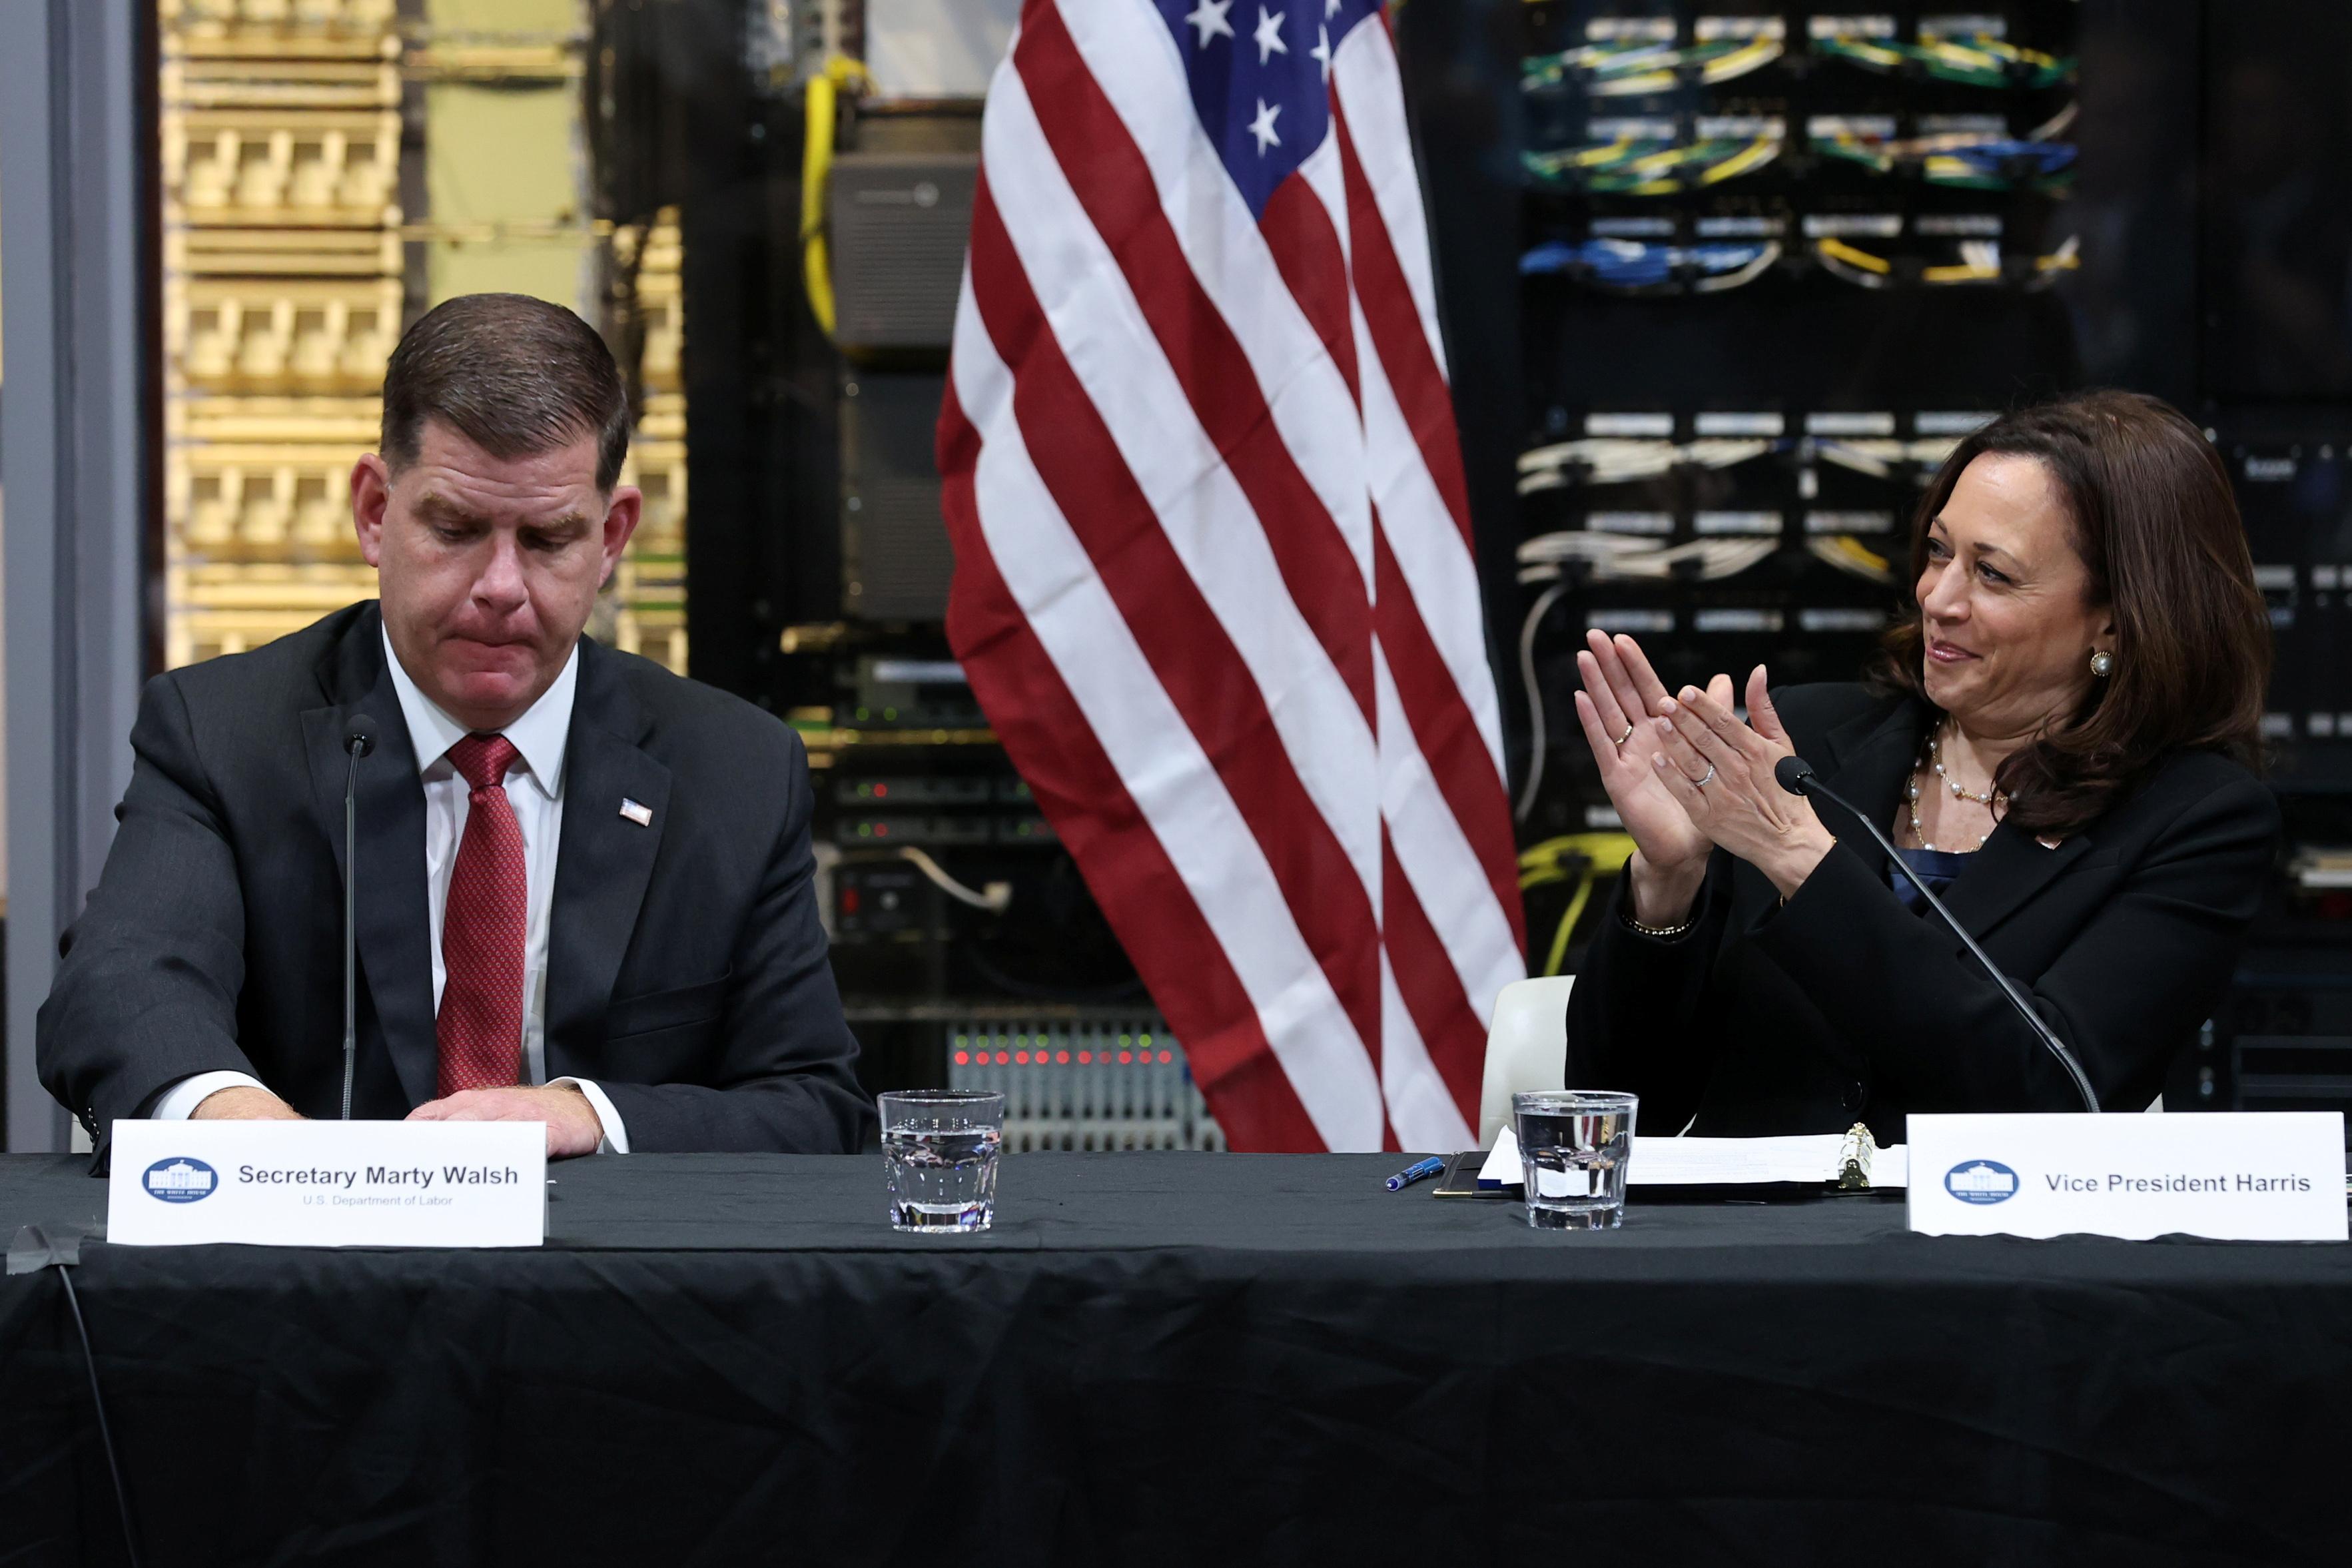 Vice President Kamala Harris and Secretary of Labor Marty Walsh. REUTERS/Jonathan Ernst